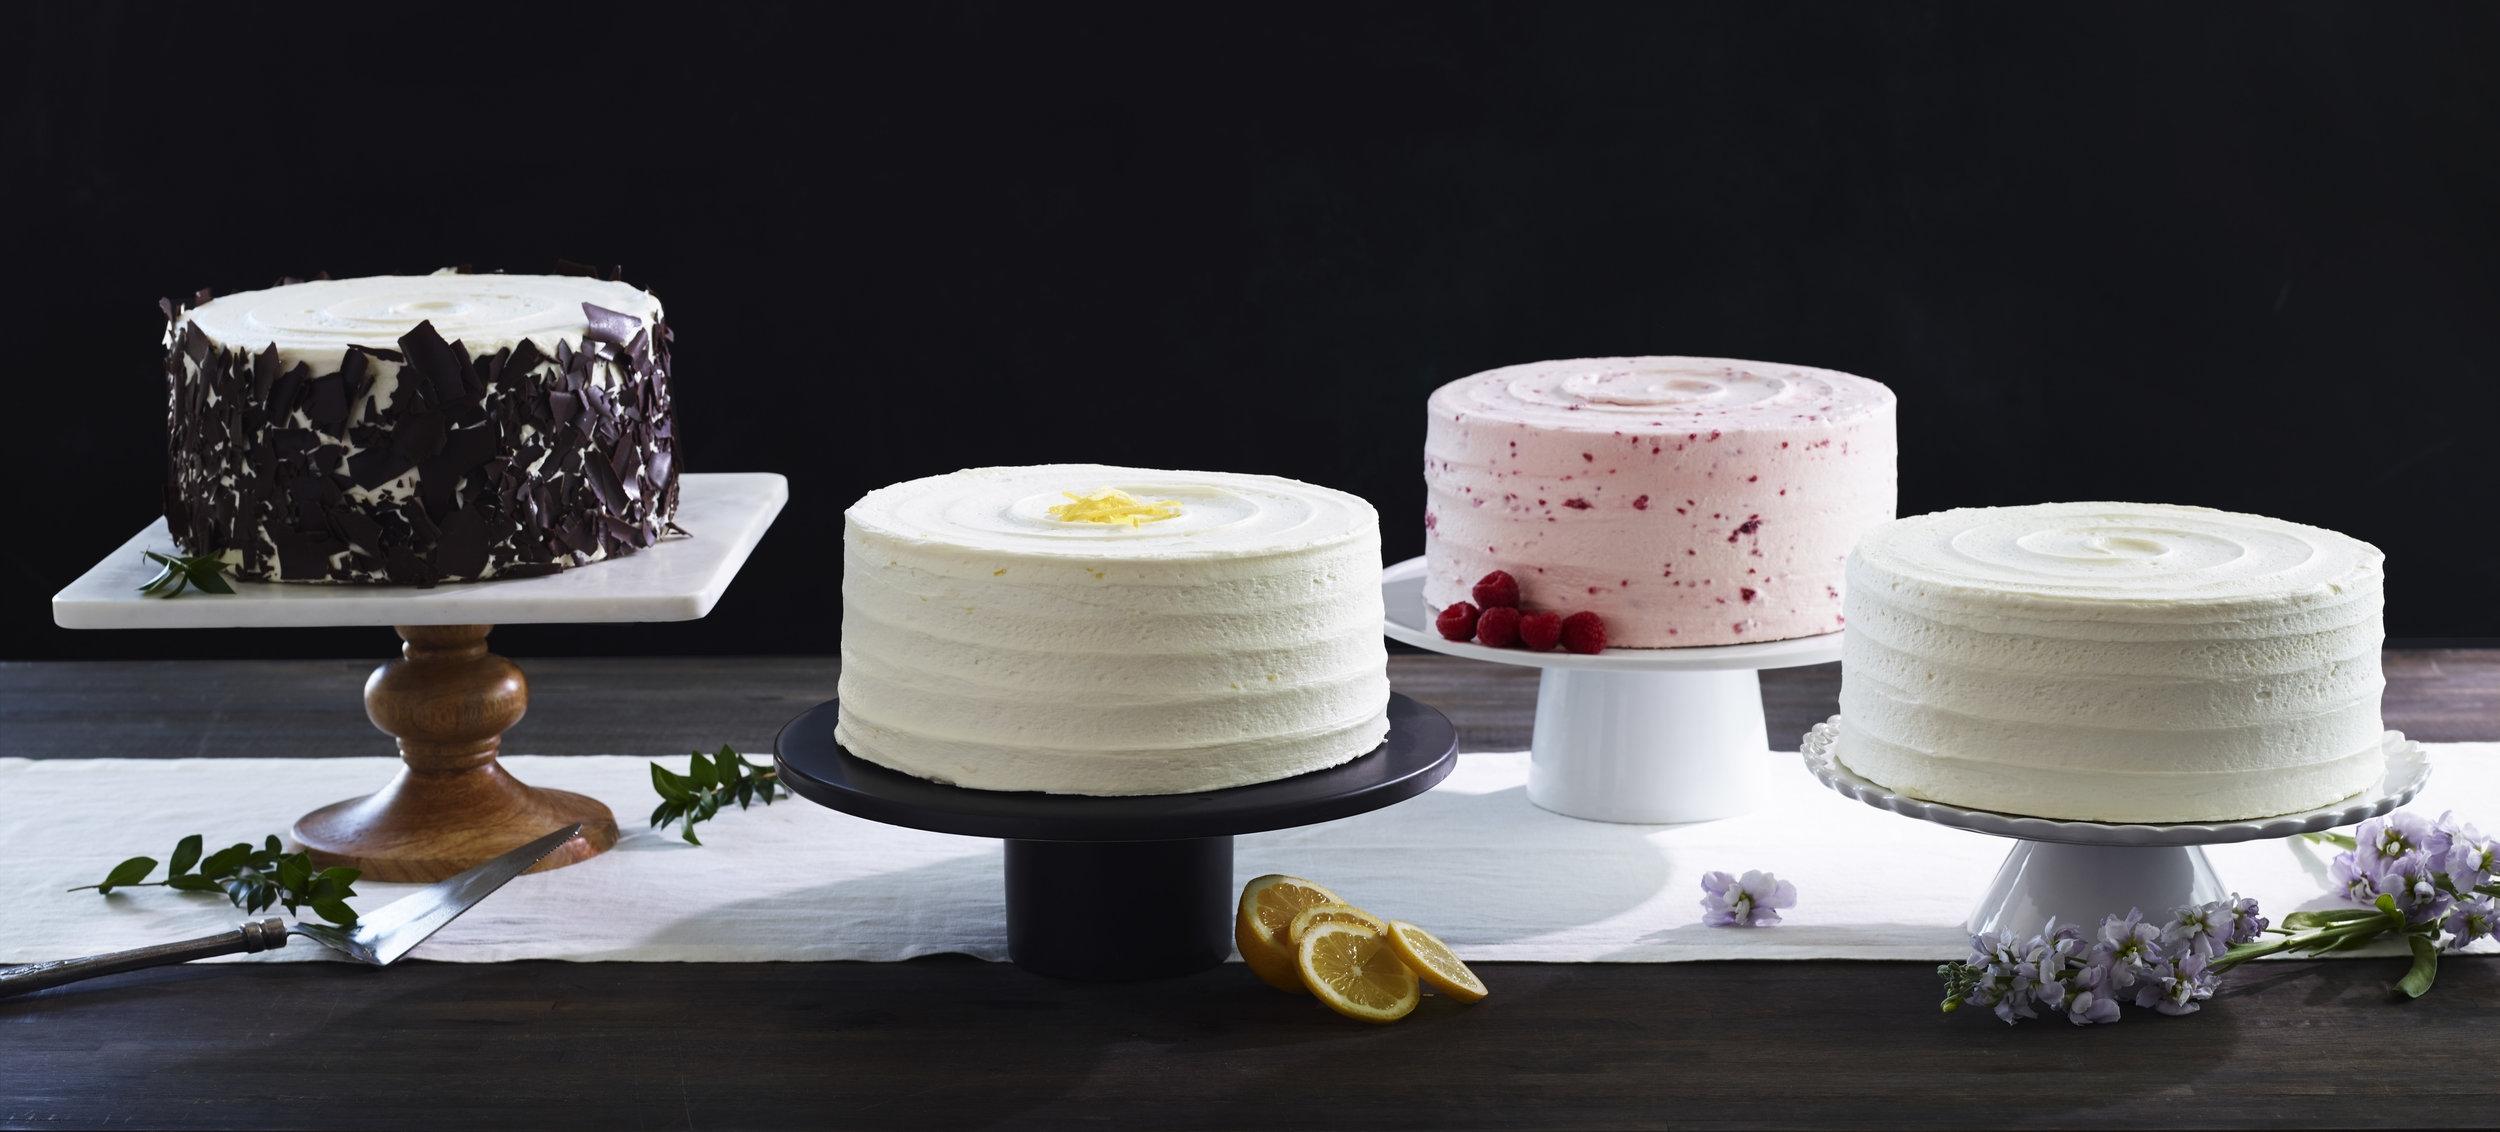 Cake grouping lower angle.jpg